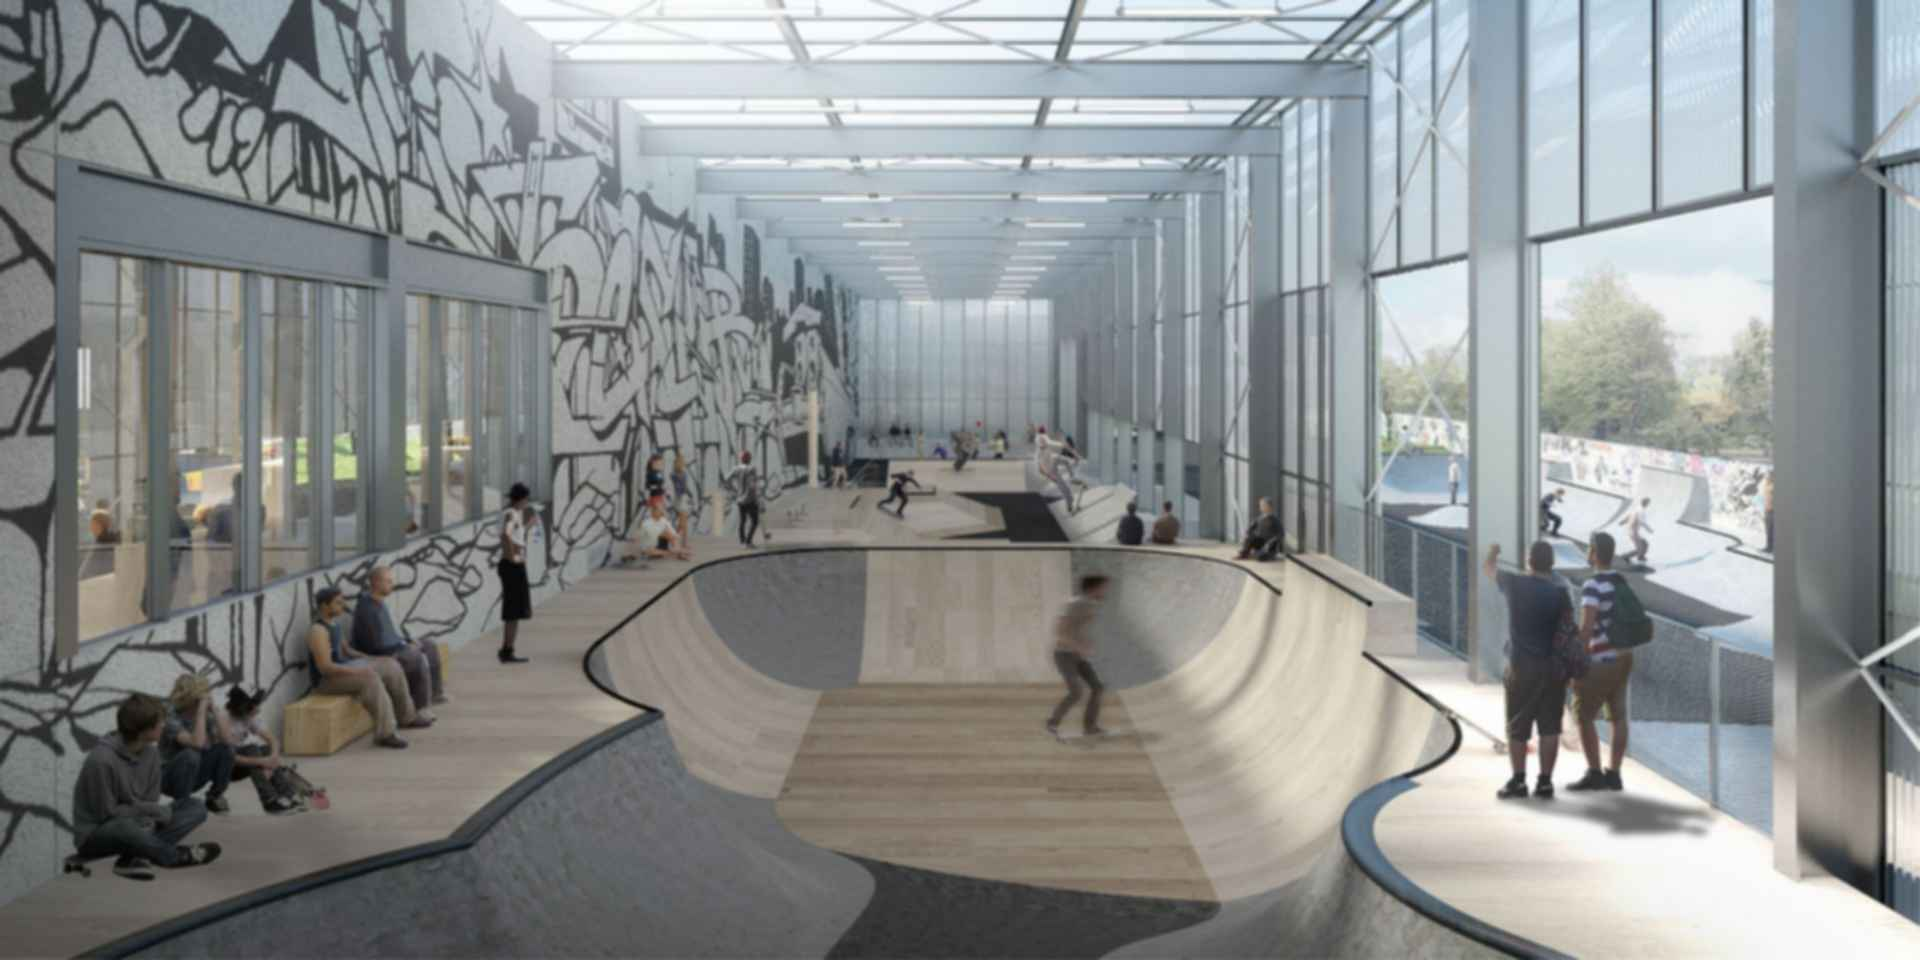 Streetmekka in Viborg - concept design skate area